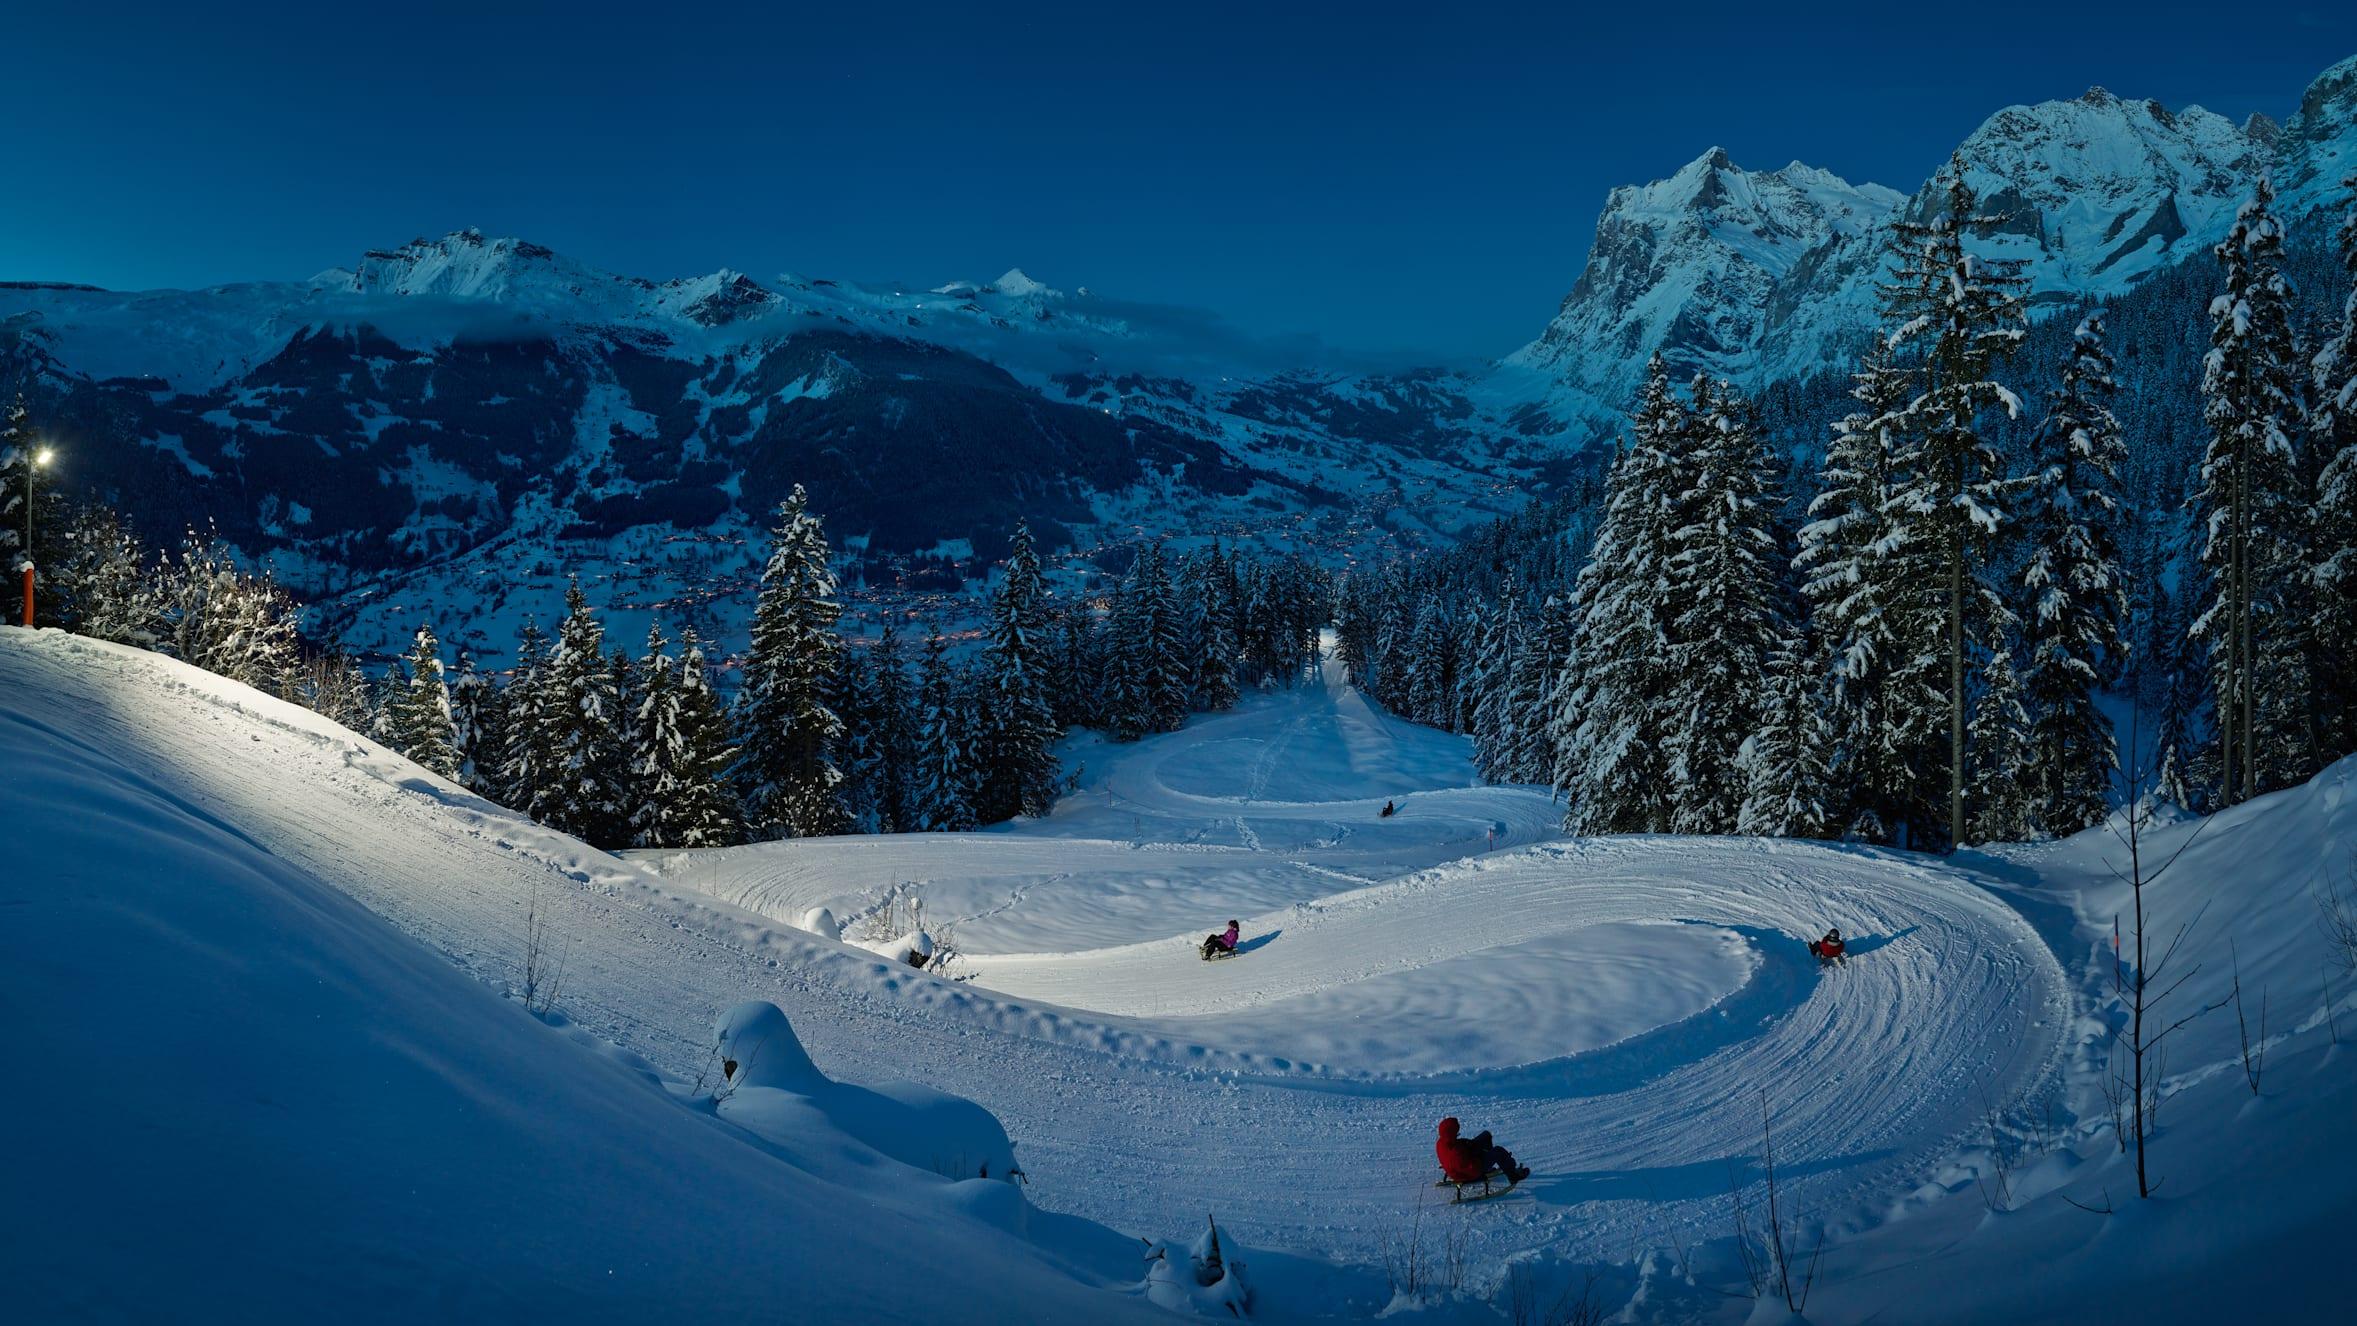 Restaurant Bussalp Eiger North Face Moench Jungfrau Hiver